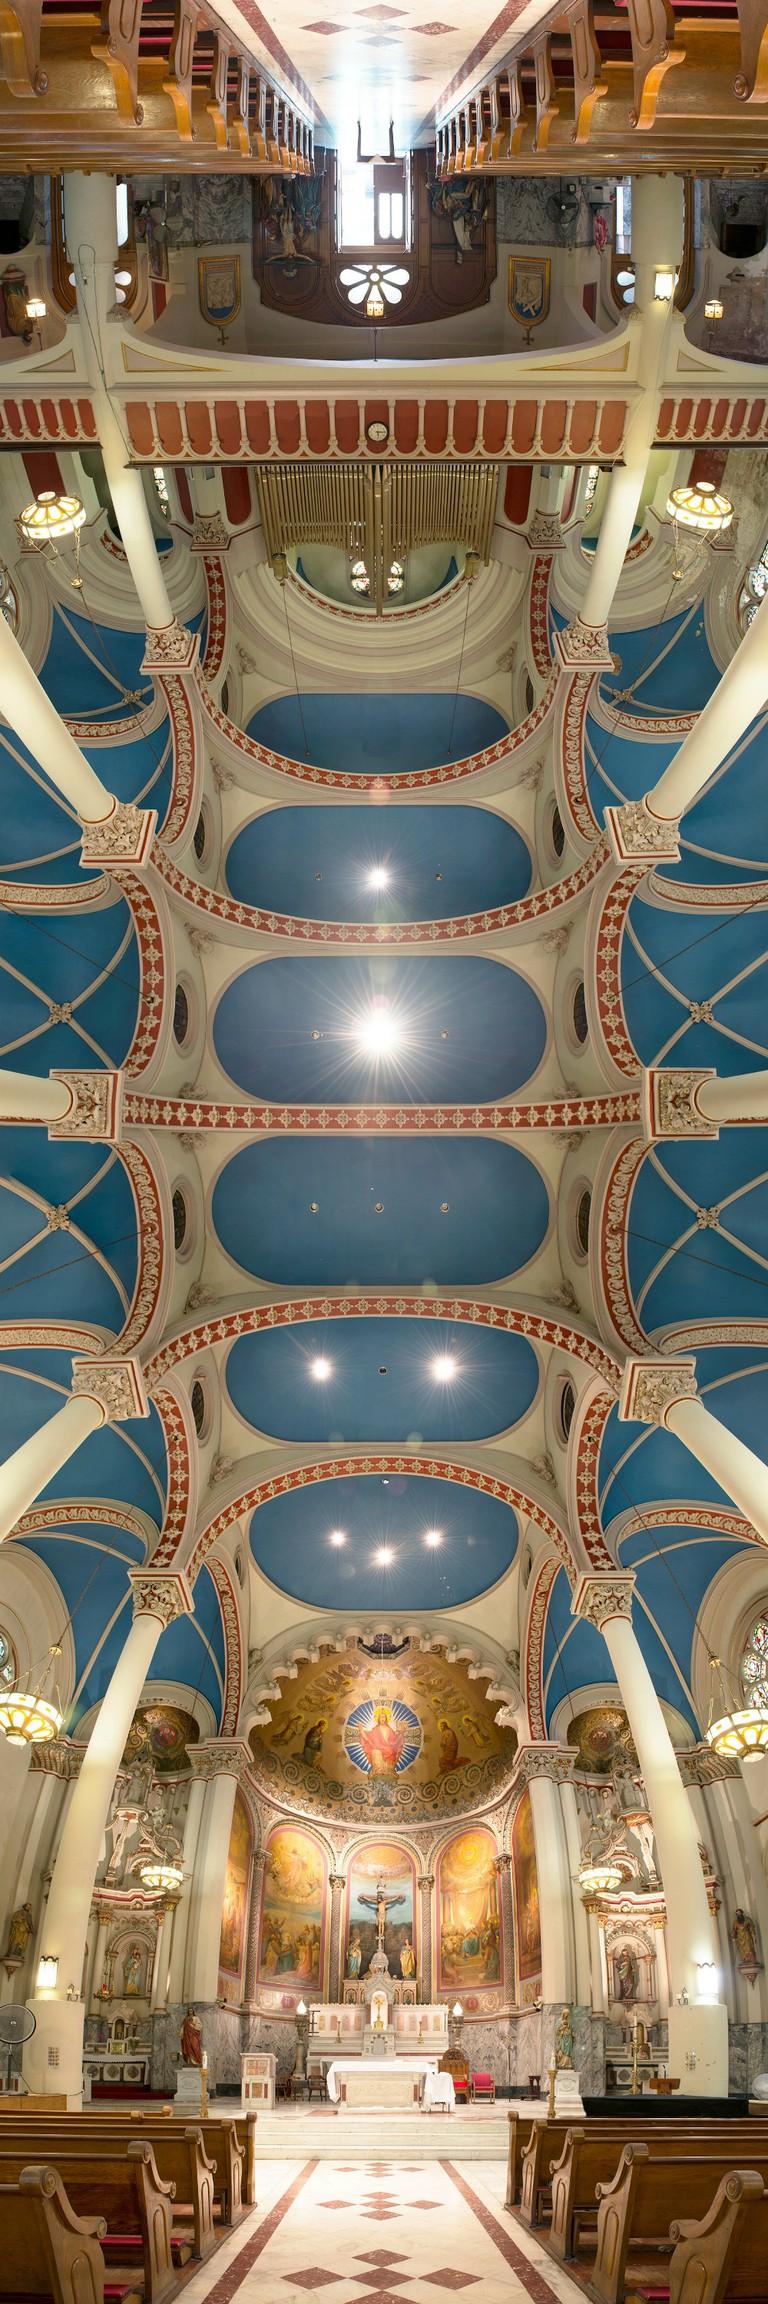 Most Holy Redeemer Church | © Richard Silver